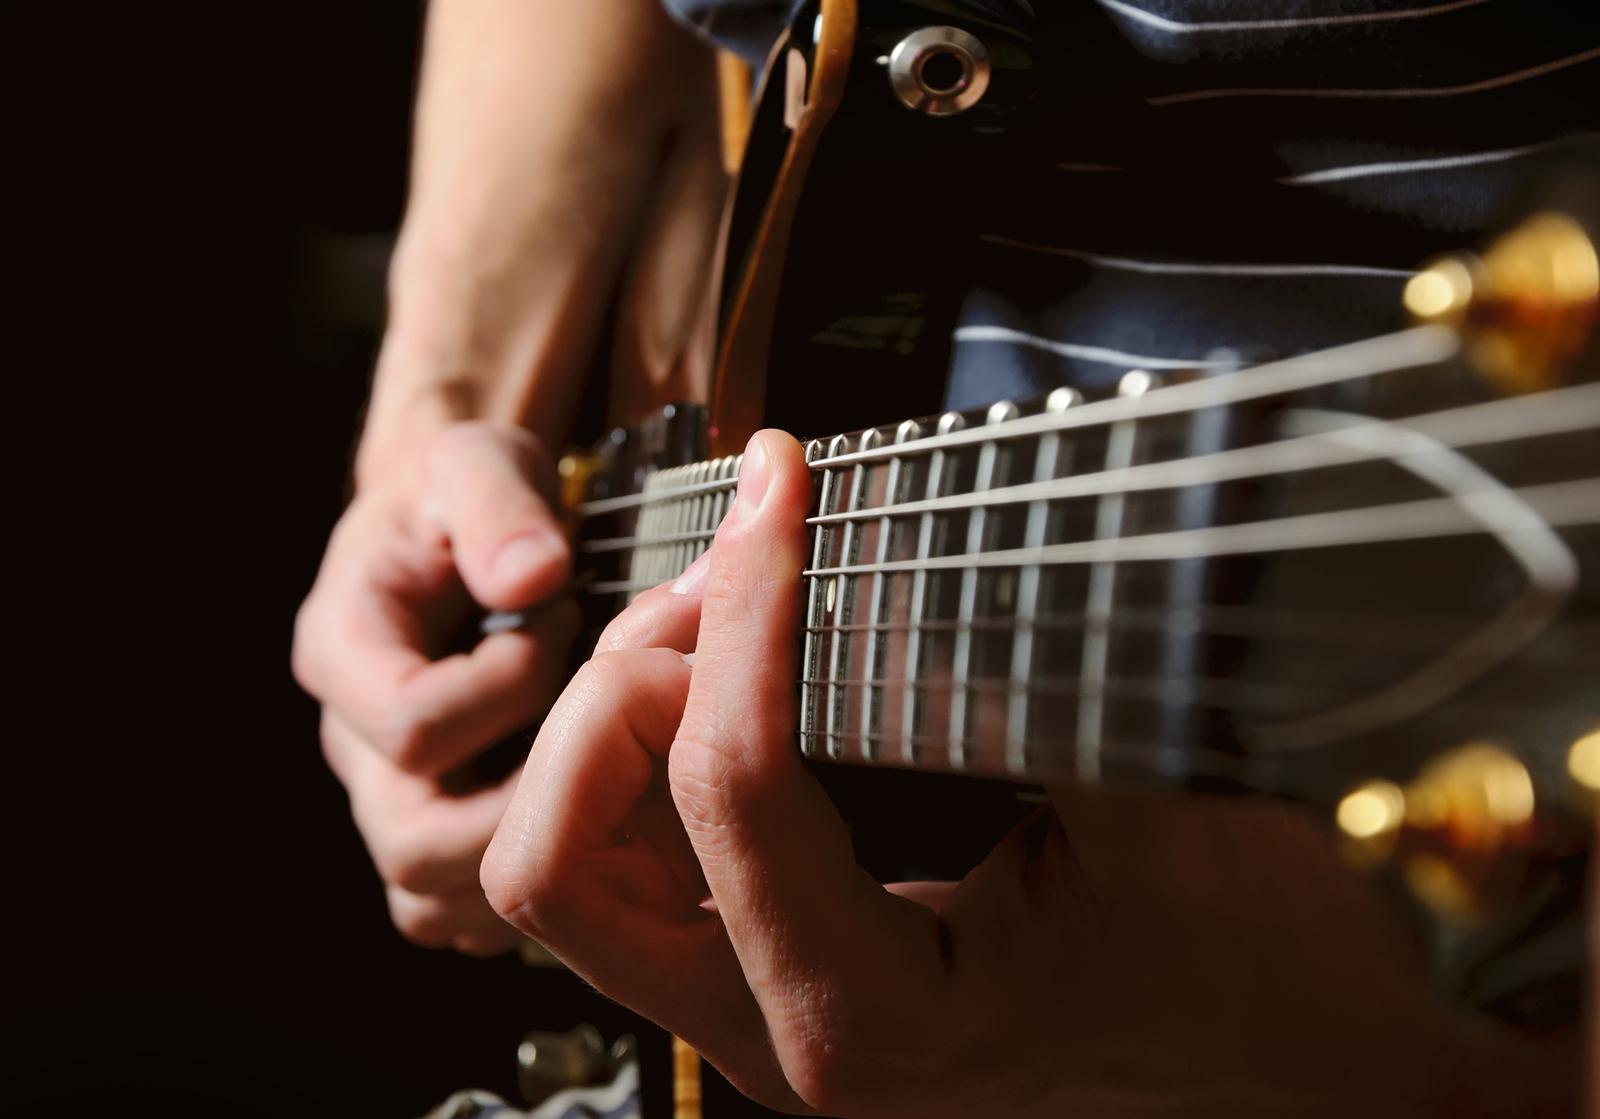 Castelo Branco promove V Festival de Guitarra dia 23